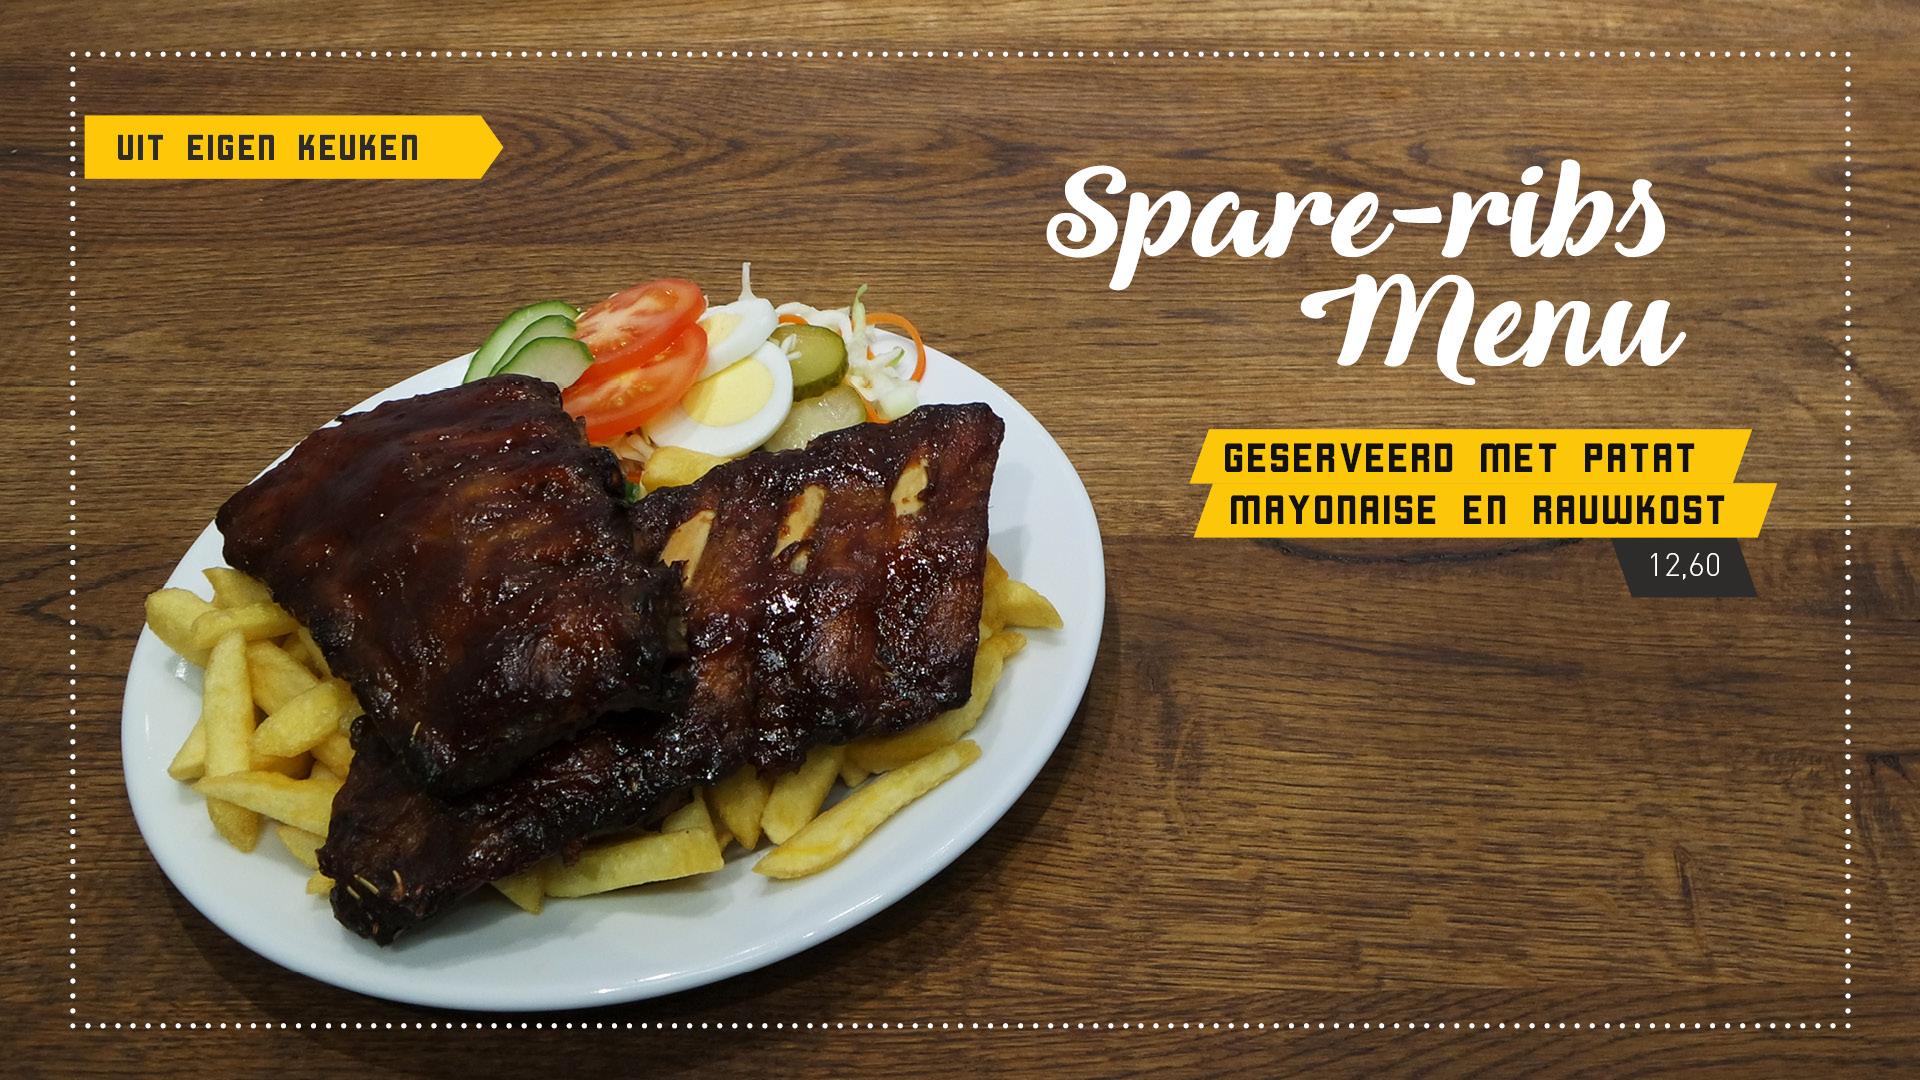 spare-ribs-menu